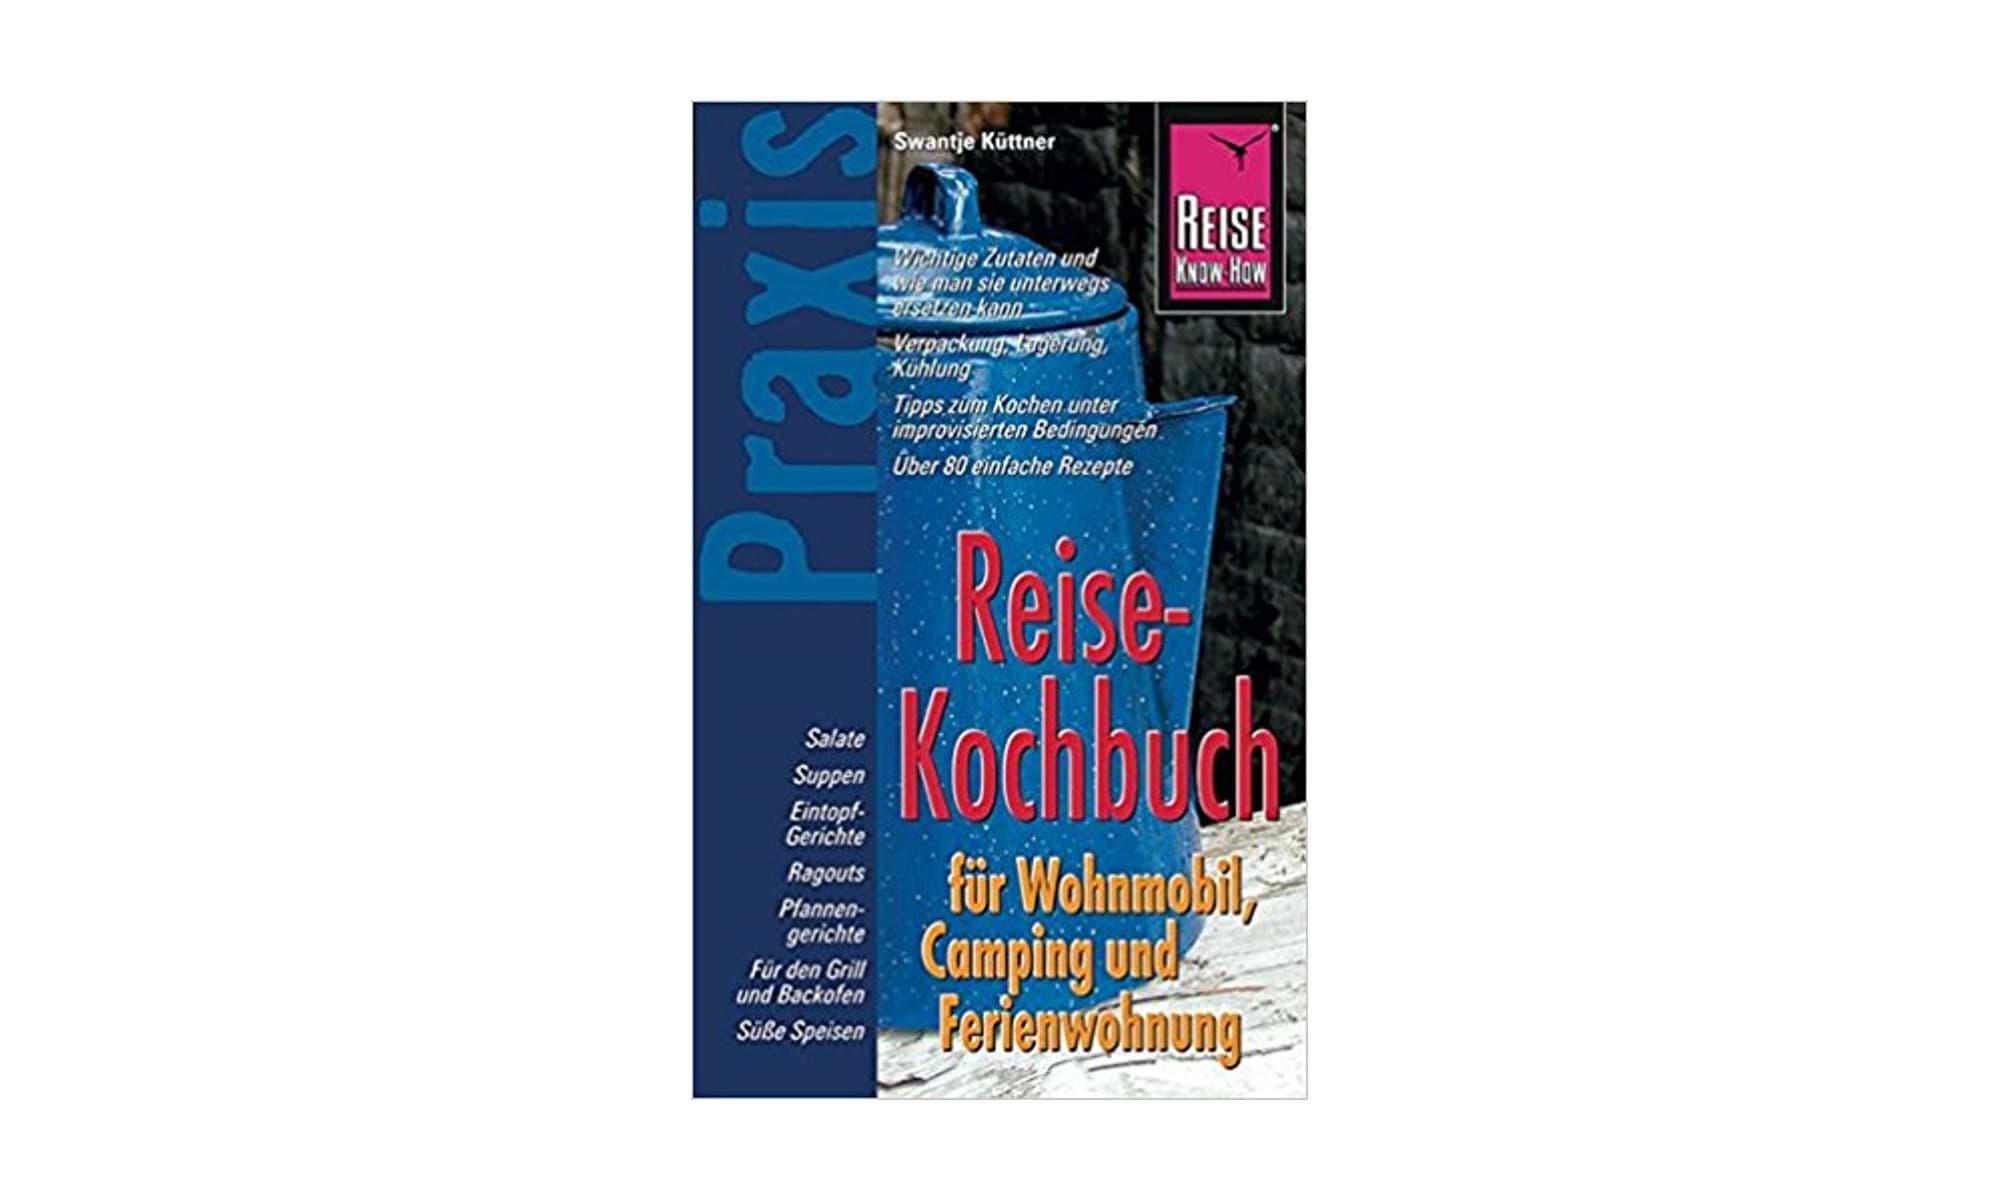 Praxis Reise Kochbuch Wohnmobil